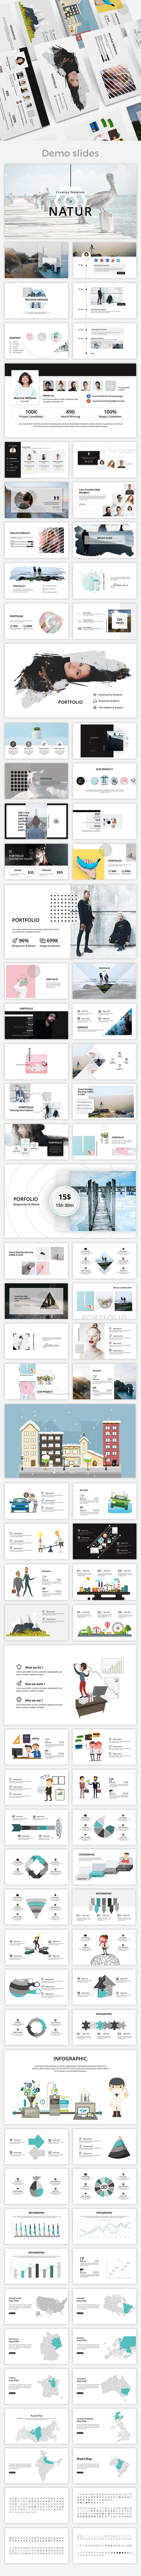 Natur Creative Powerpoint Template - Creative PowerPoint Templates